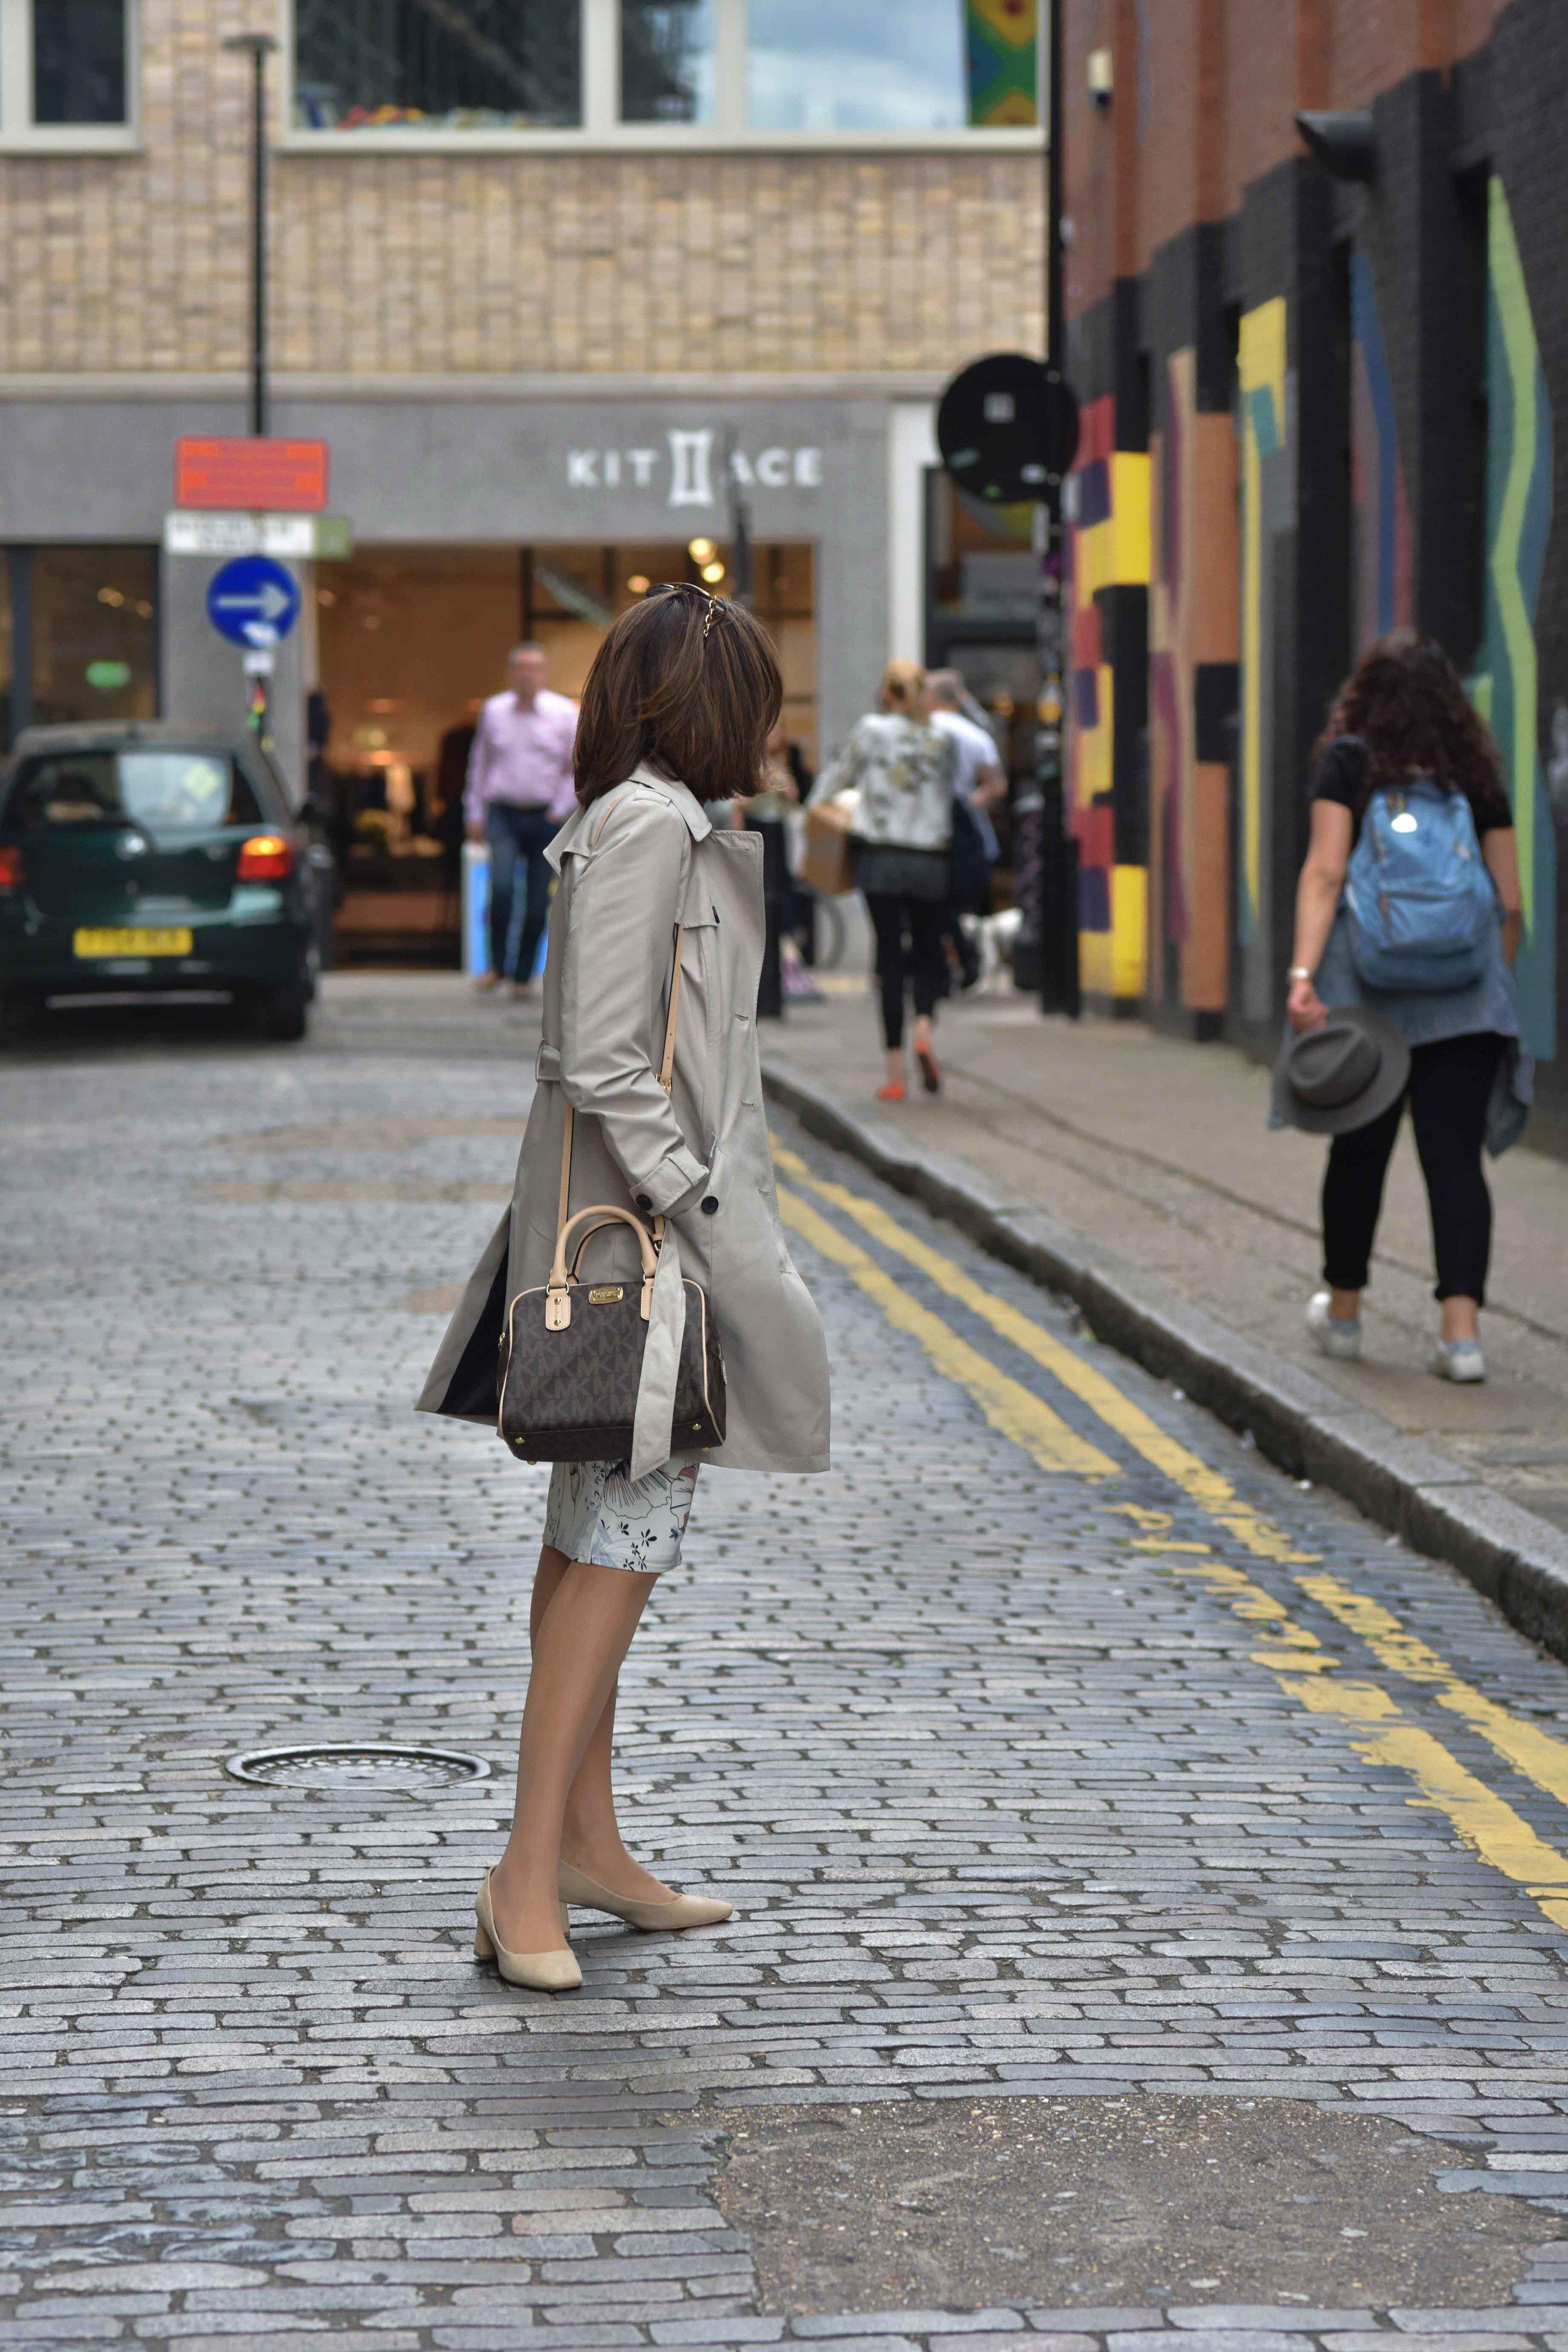 Marks and Spencer shift dress, Marks and Spencer trench, Zara sandals, Michael Kors handbag, street fashion, street art, Shoreditch, London, U.K. Photo: Nina Shaw, Image©sourcingstyle.com